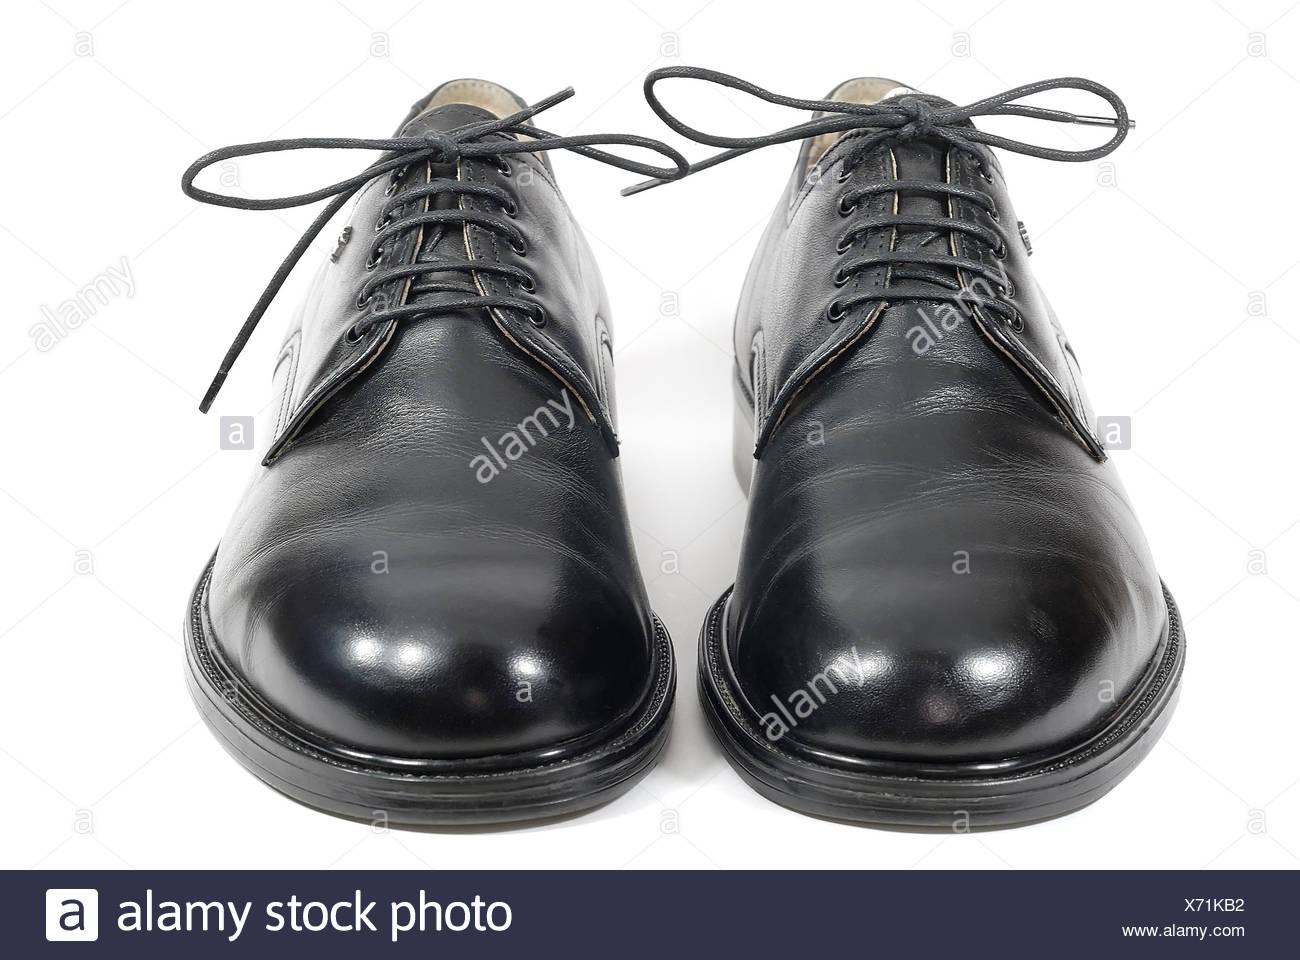 black shoes 04 - Stock Image